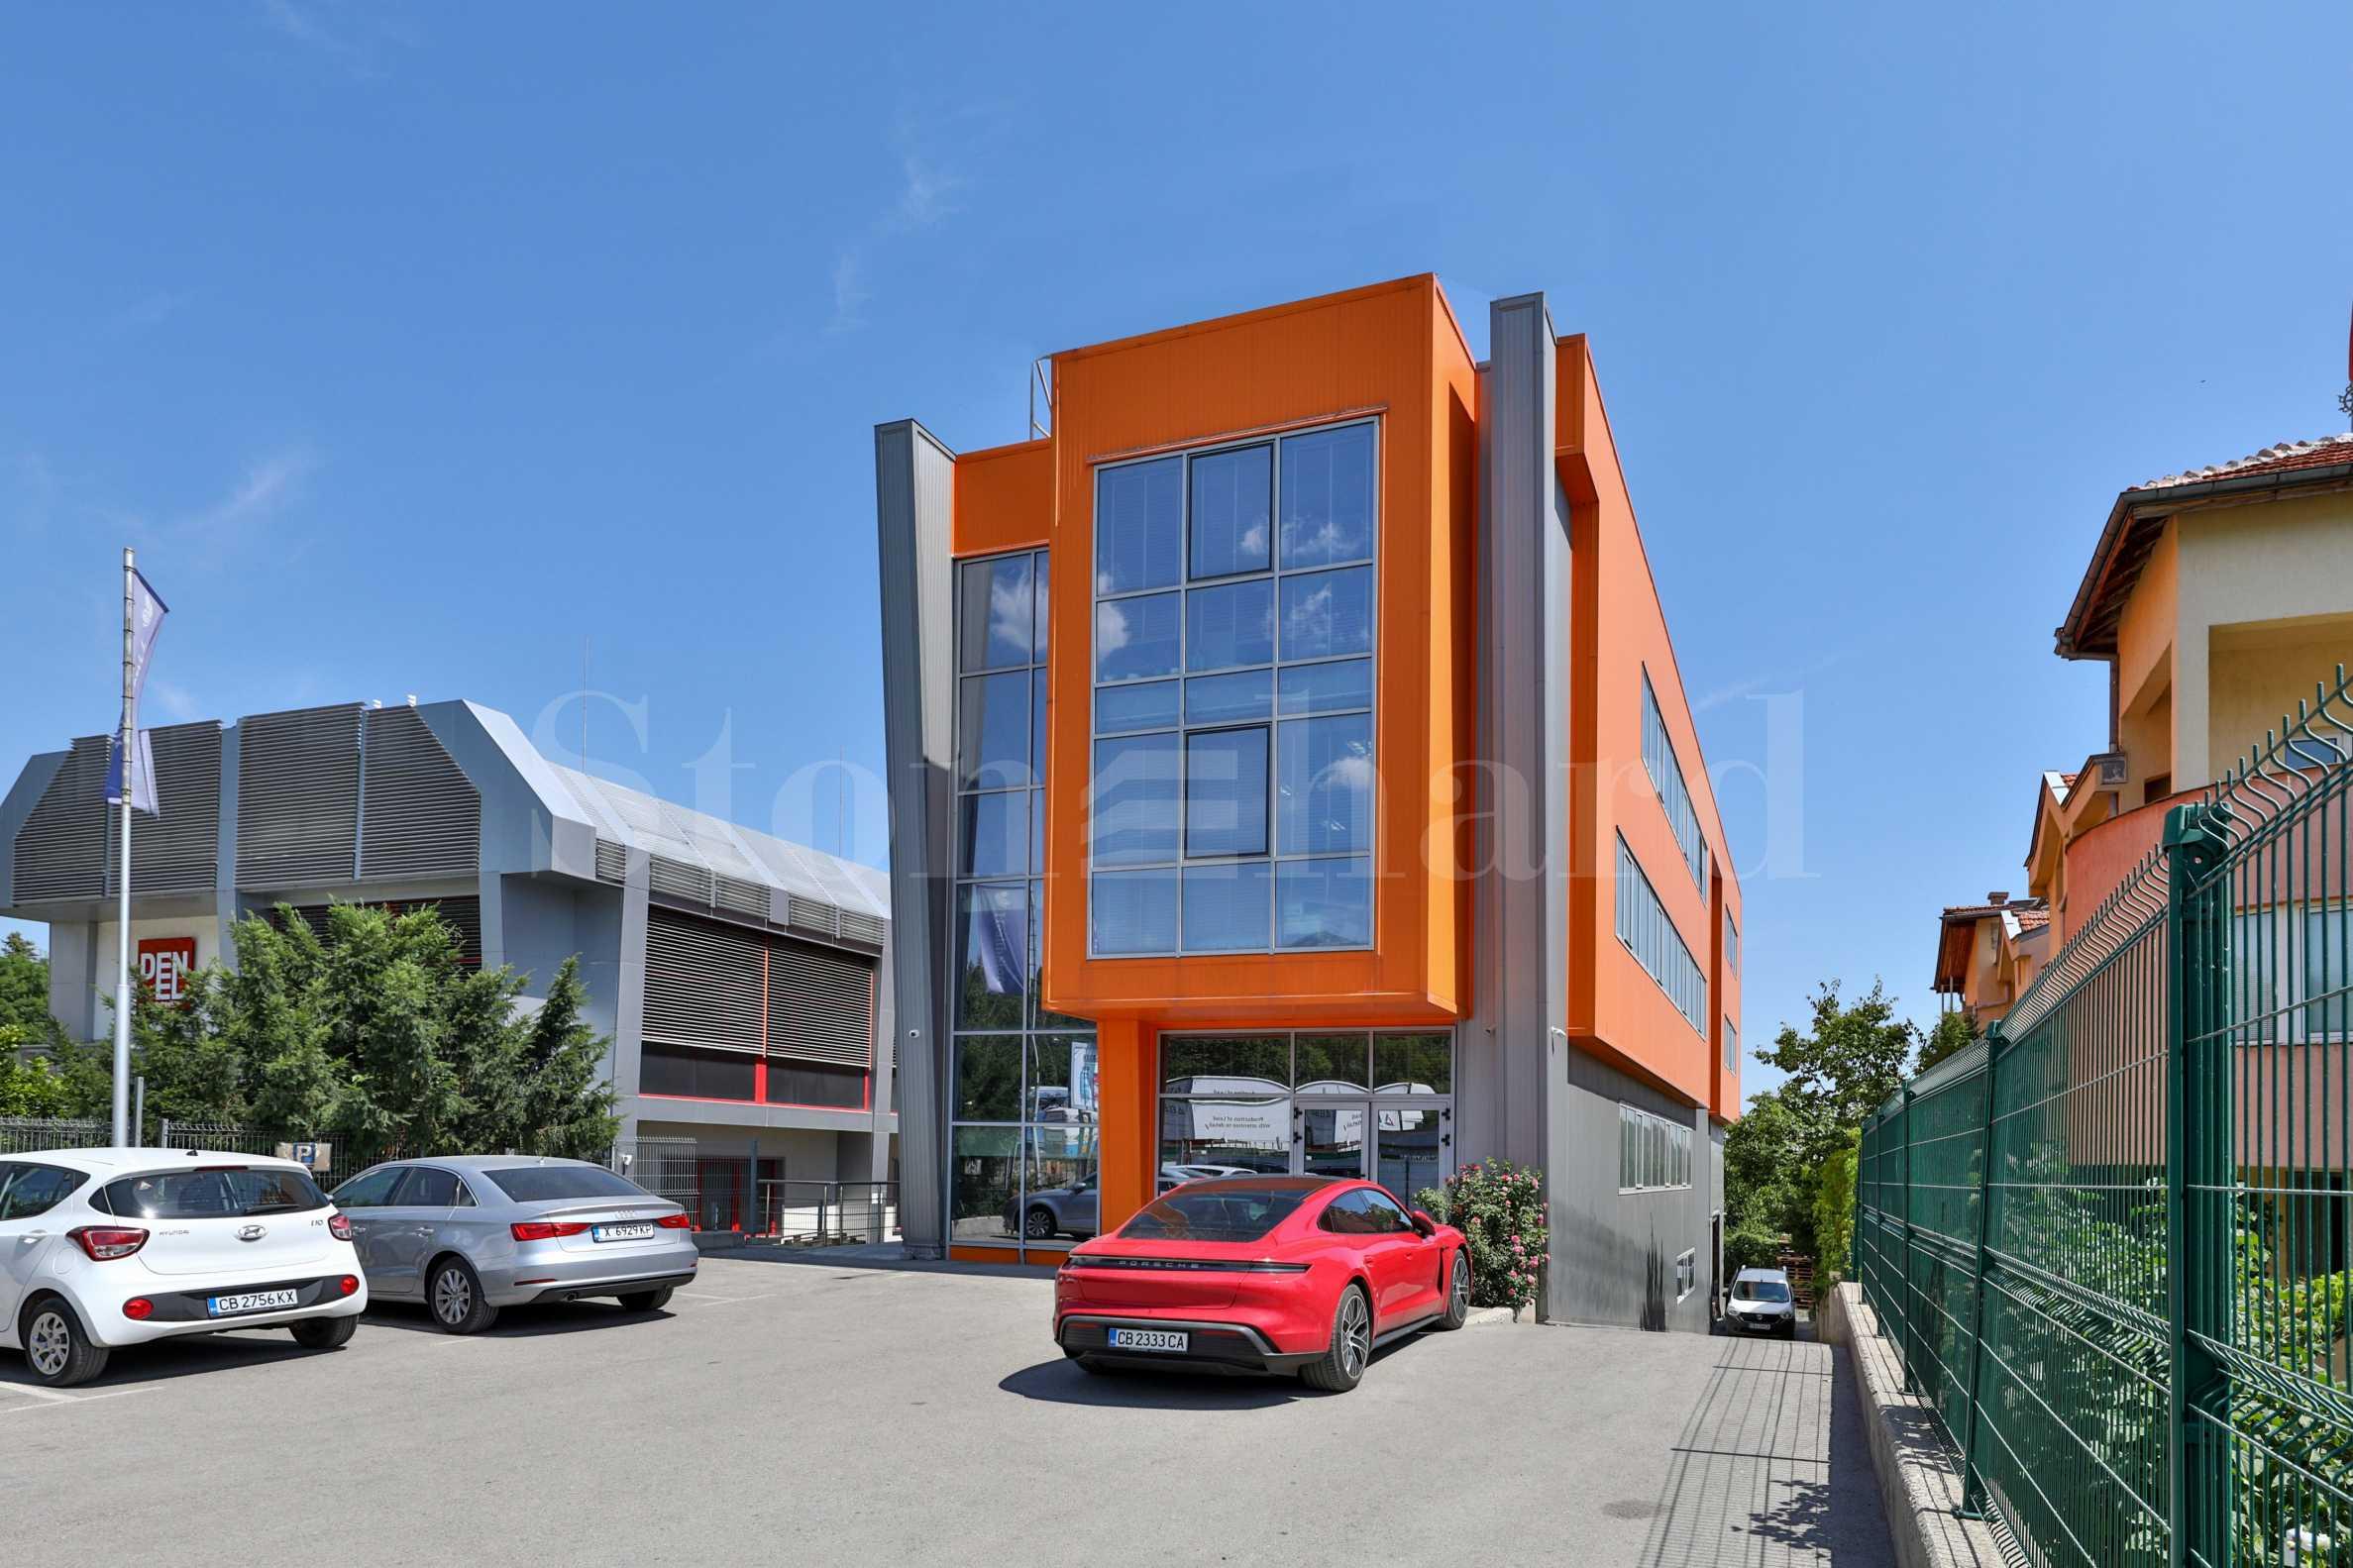 Building in Sofia1 - Stonehard